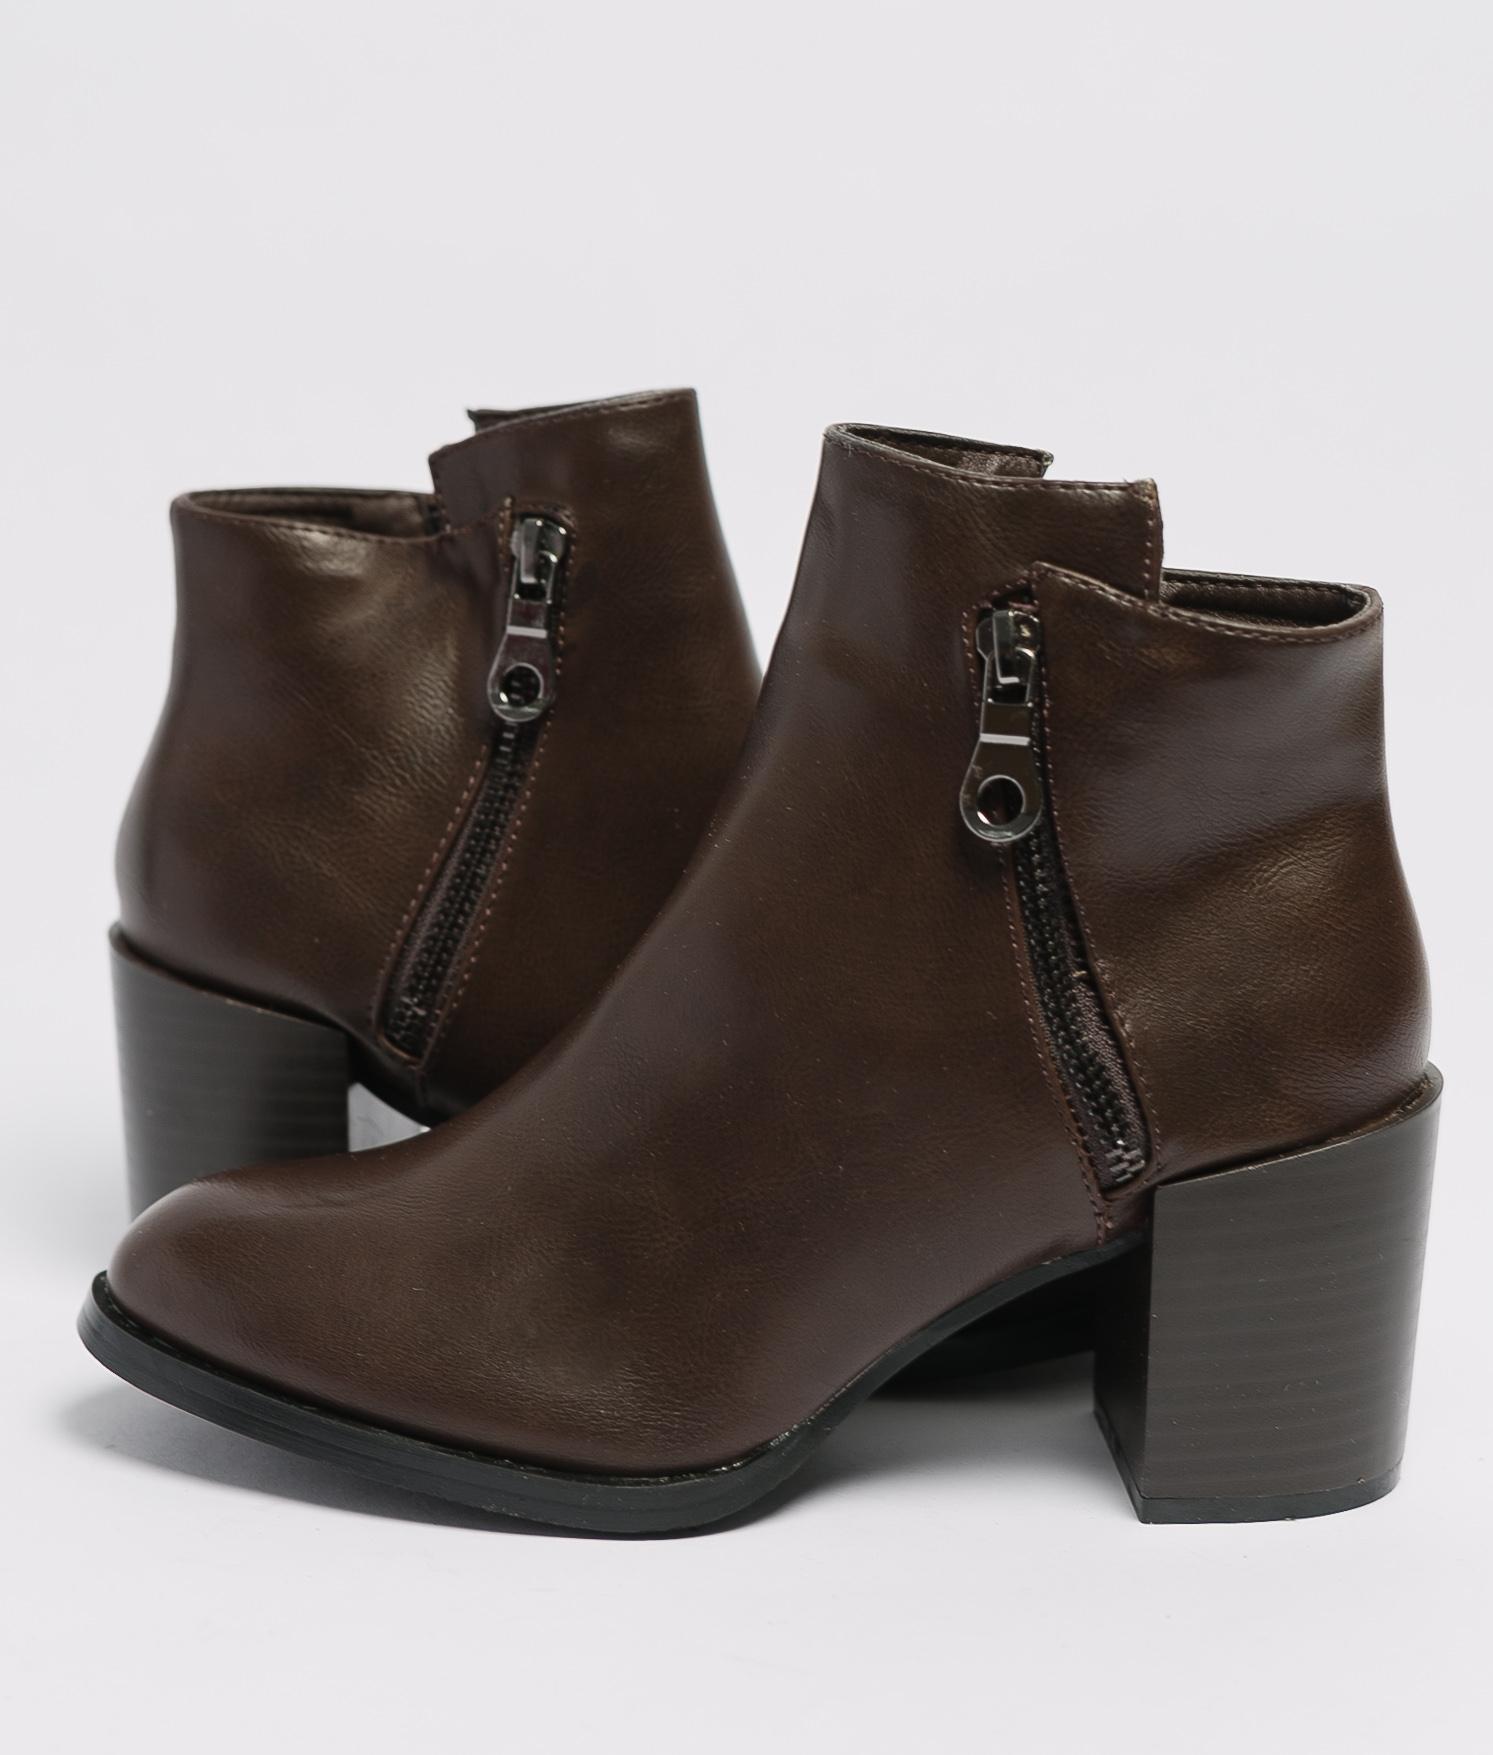 Boot Petite Trica - Marron